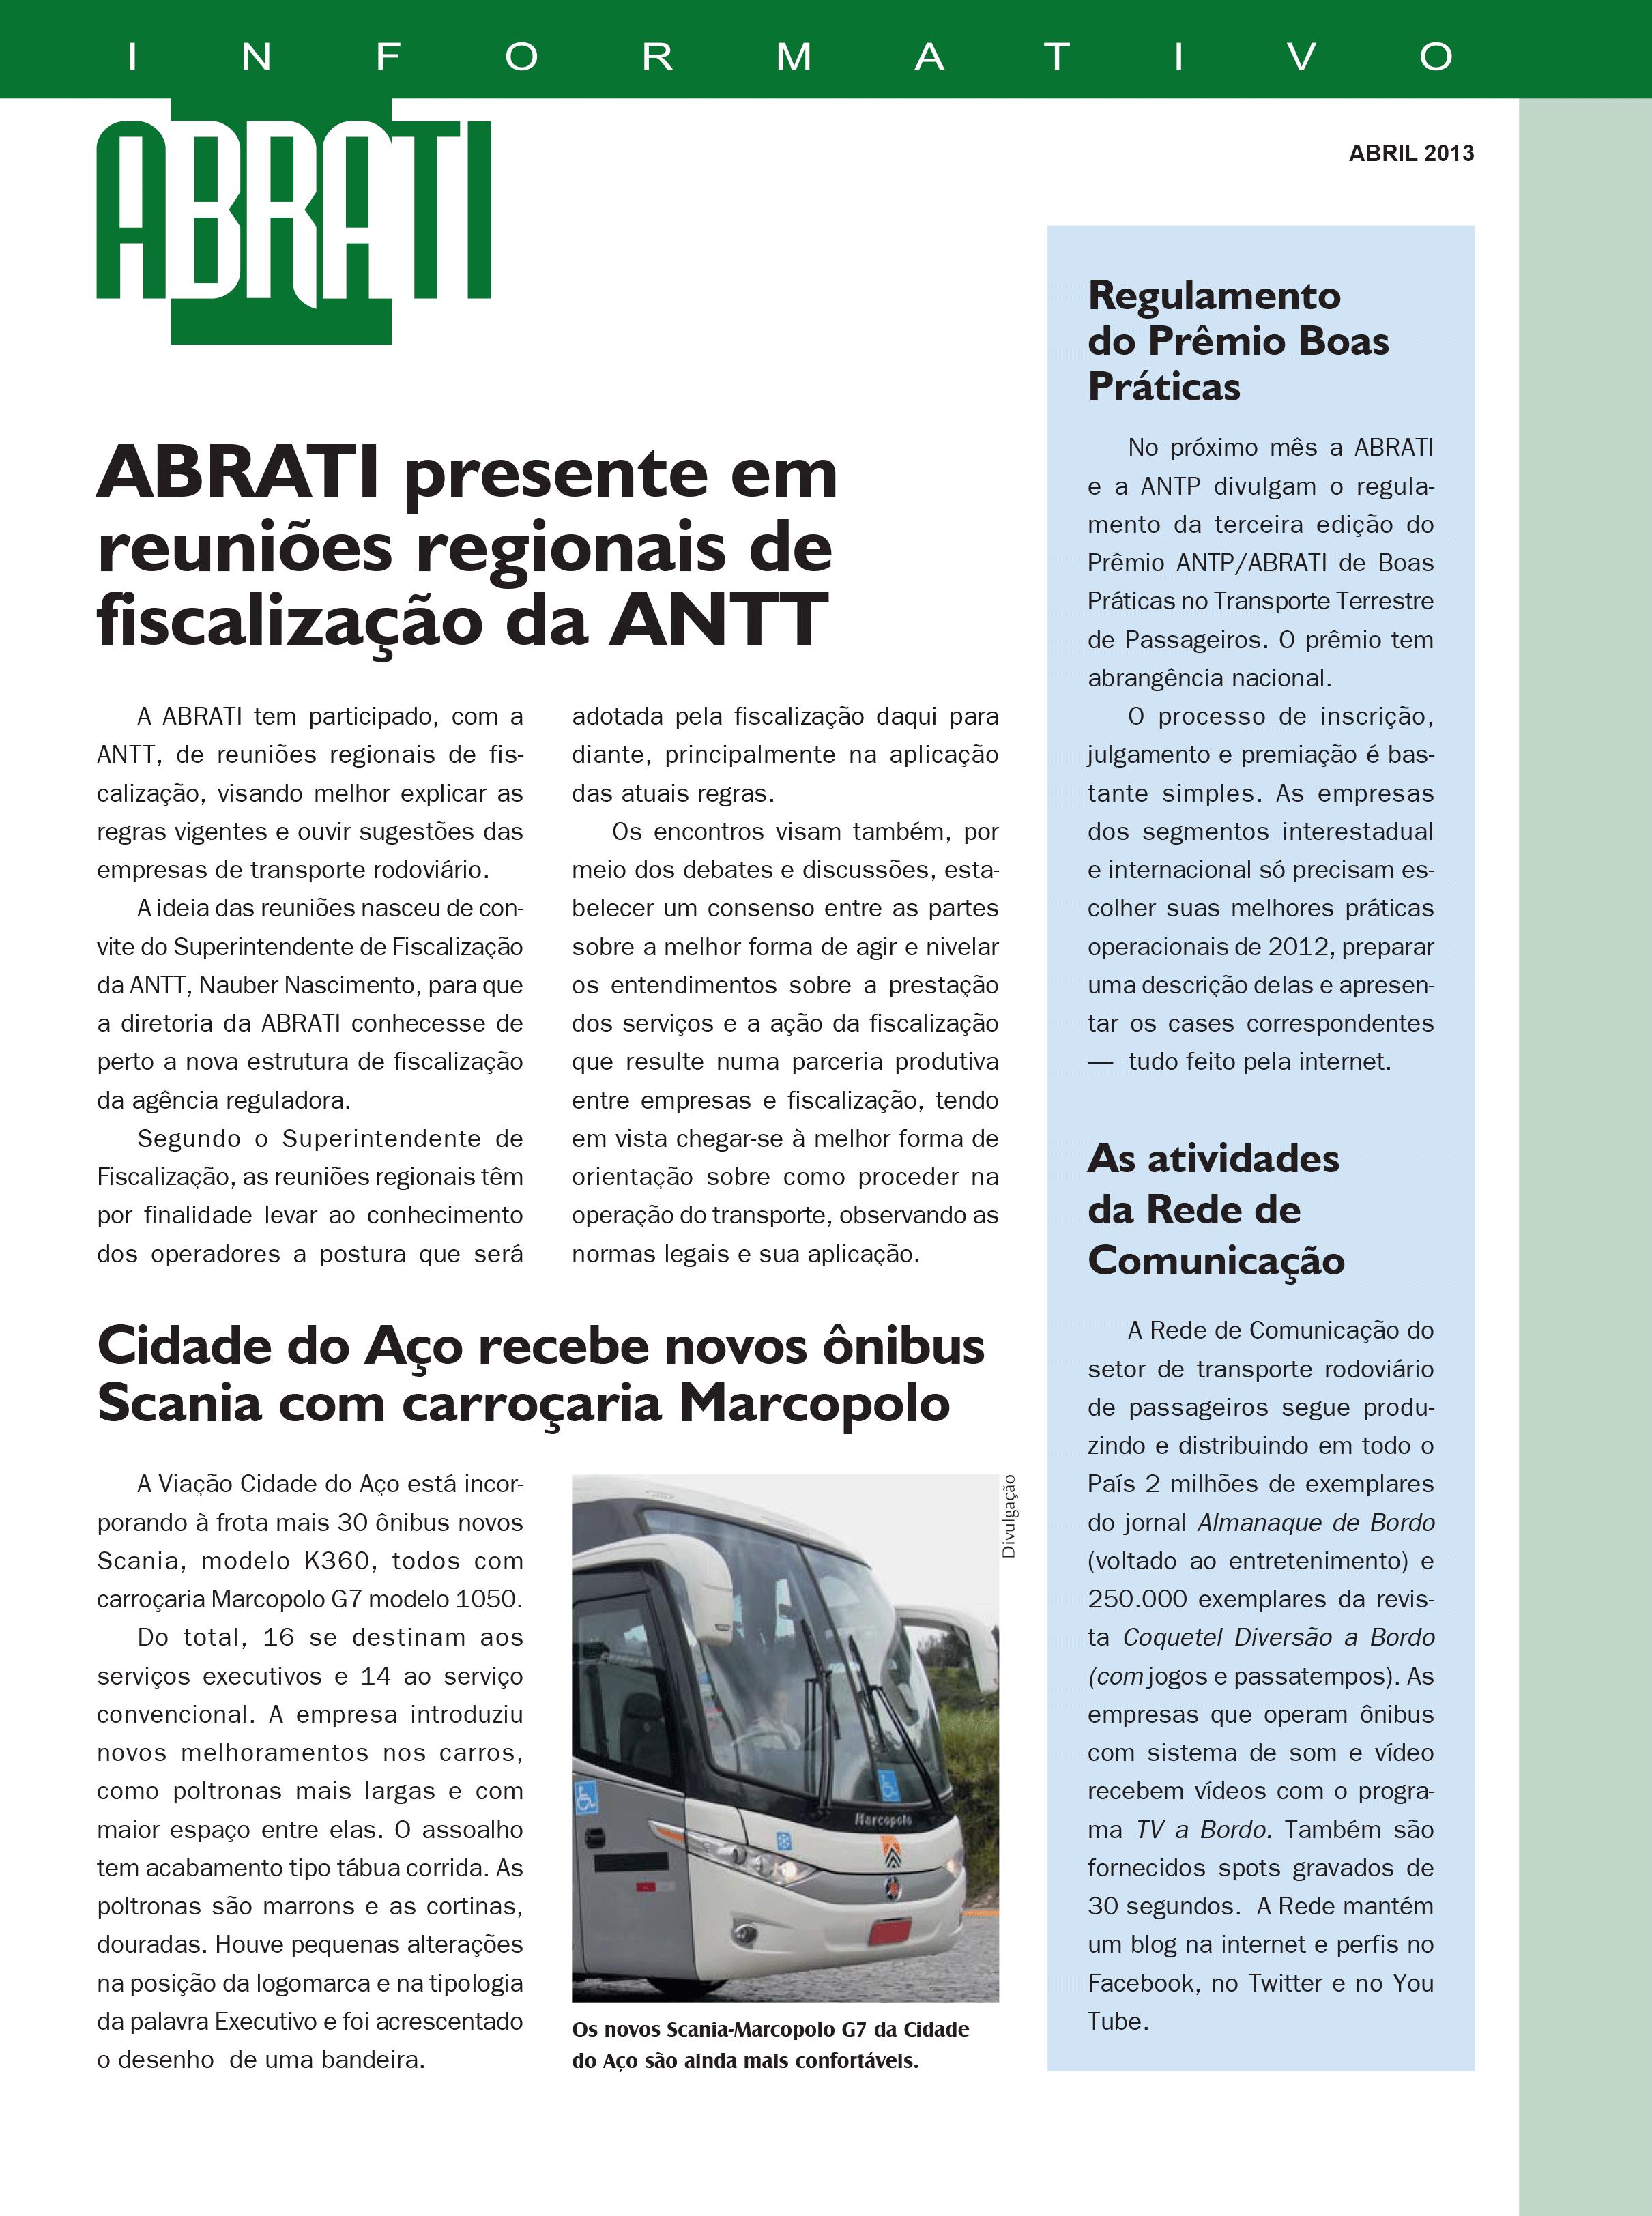 Informativo Abril 2013